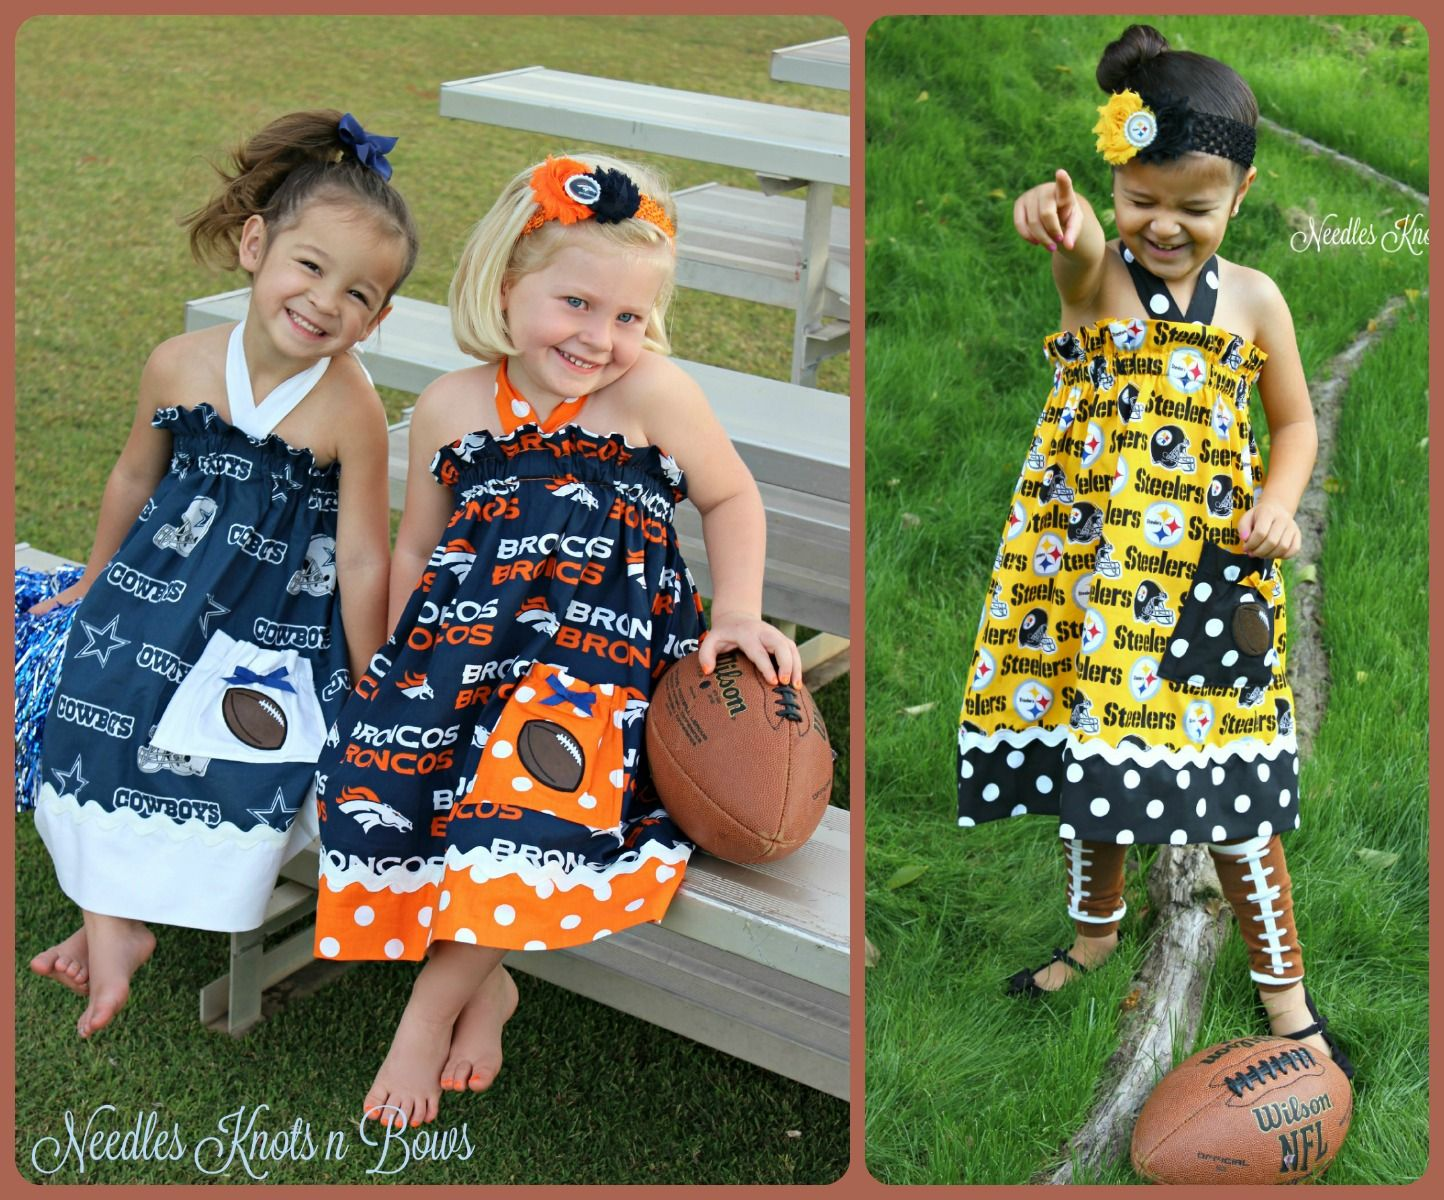 aeaa4ac0 Summer dress size 4 footballs | denver broncos football | Football ...